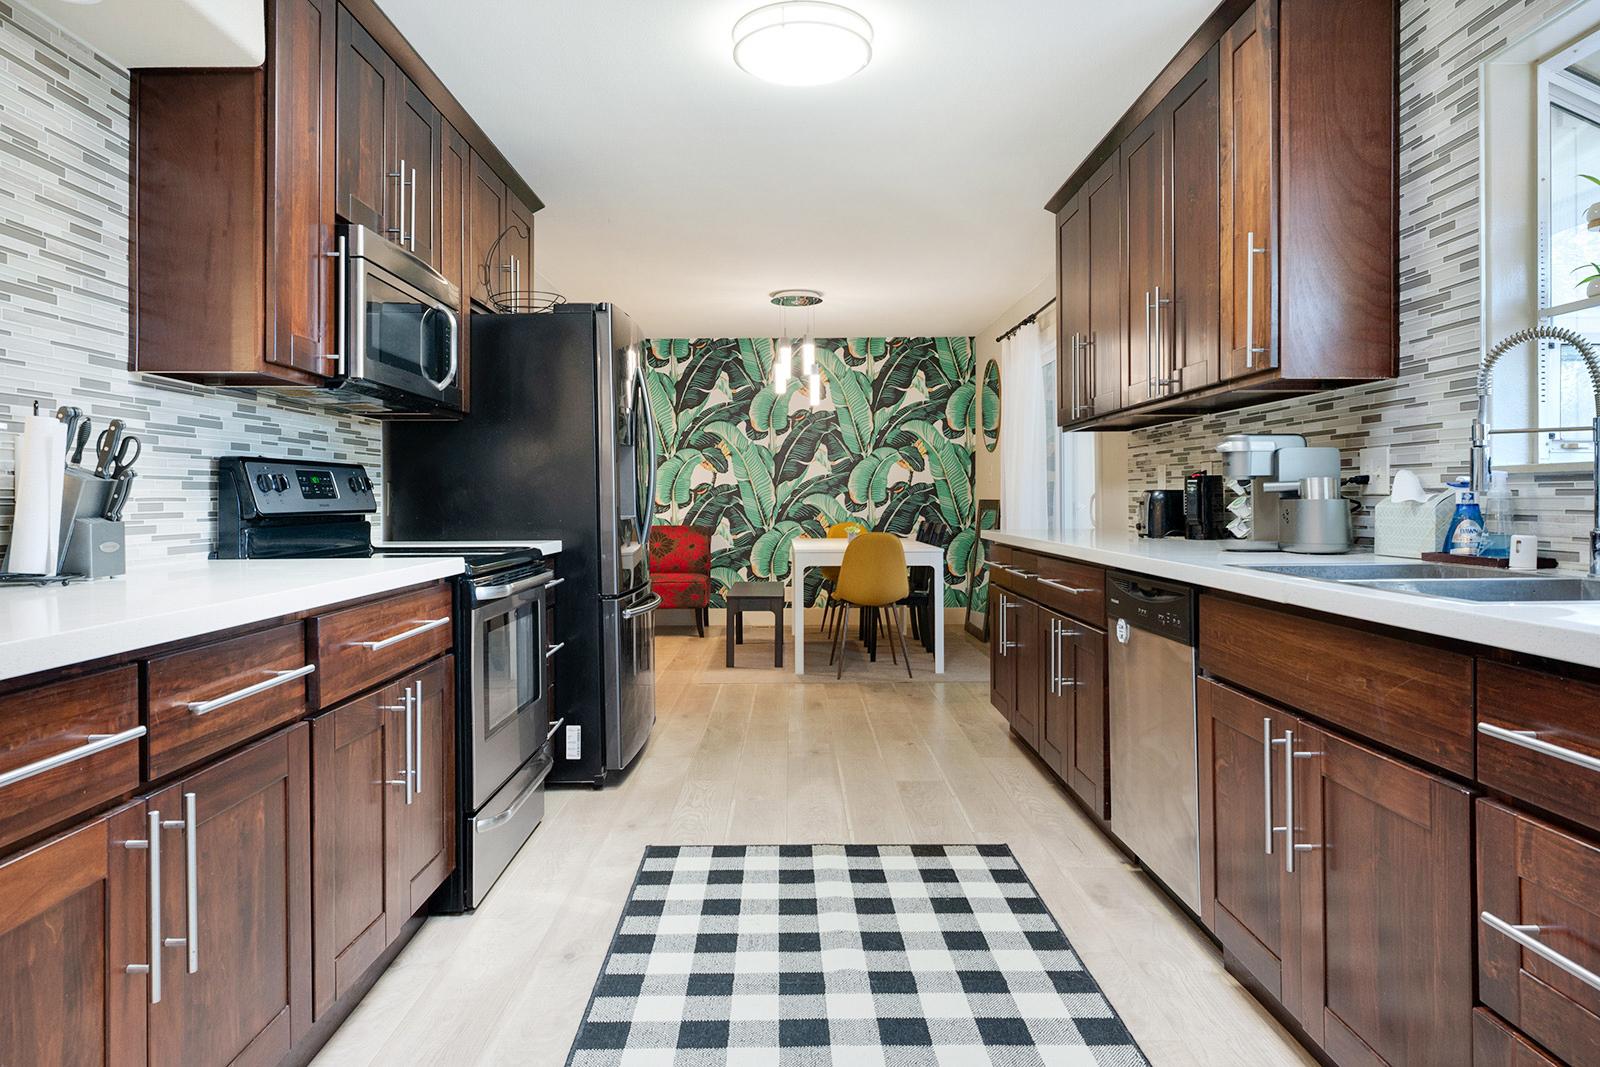 Kitchen of home at 6235 Everest Way, Sacramento, Ca.